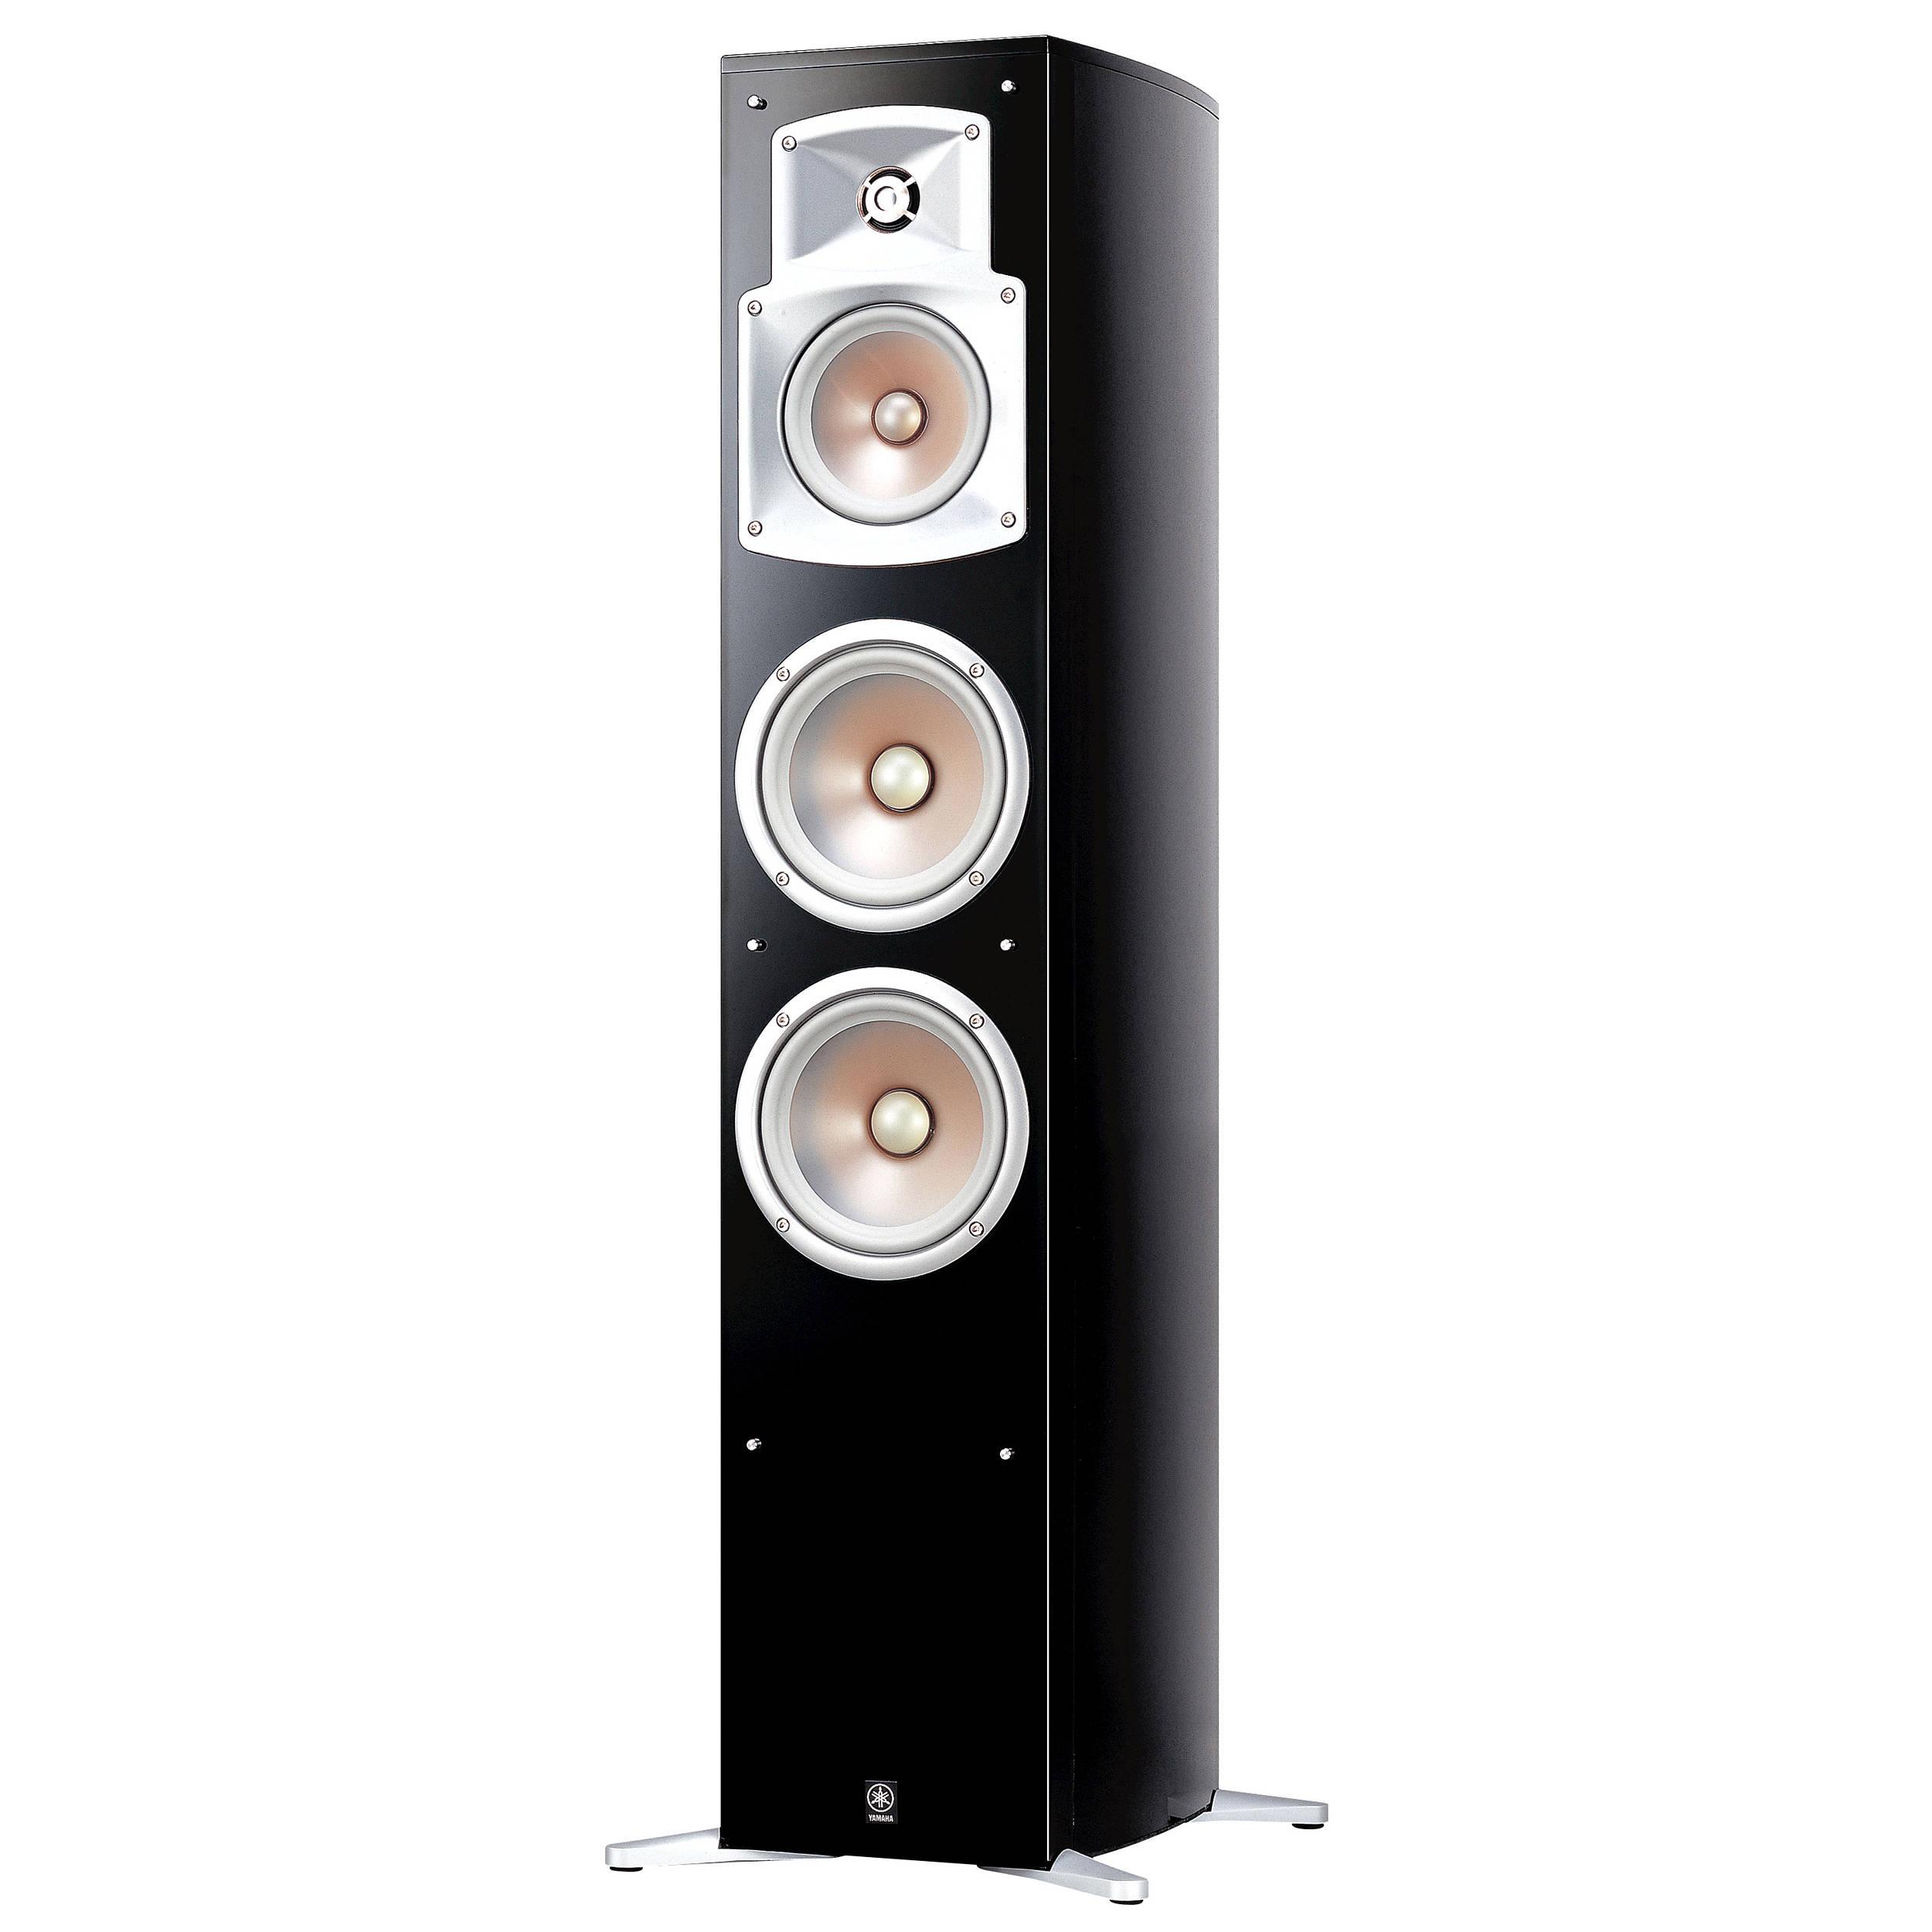 Yamaha Floor Speaker Reviews